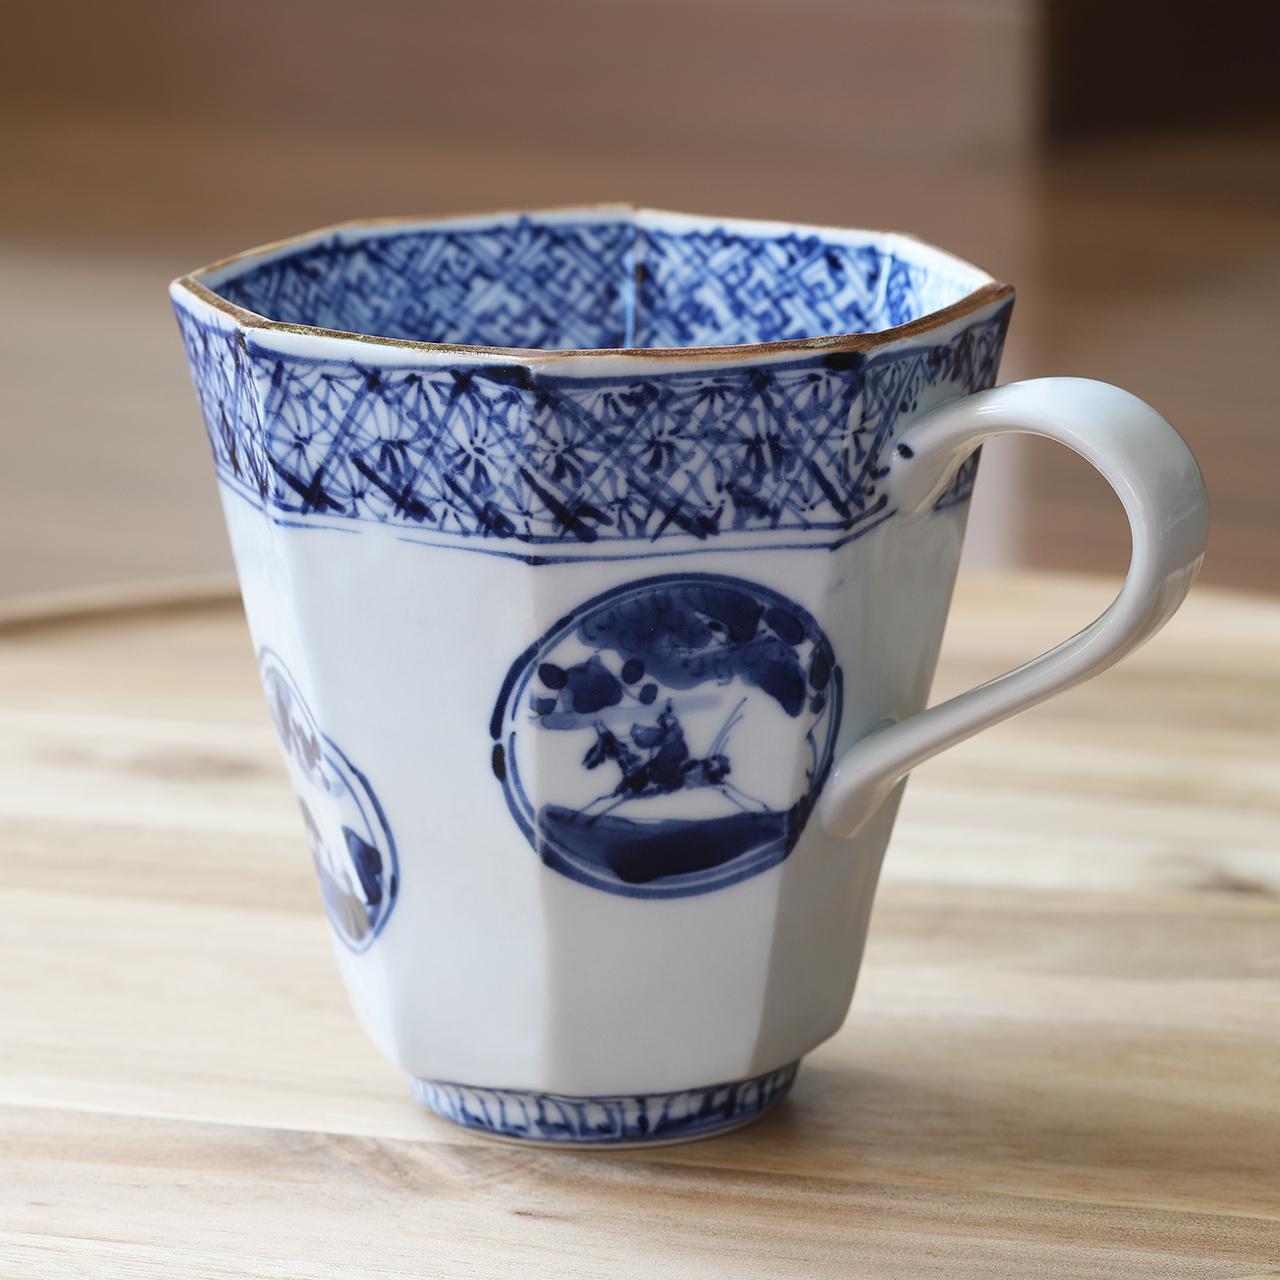 松尾貞一郎 祥瑞山水図 八角マグカップ 210204-K26 貞土窯(有田焼)